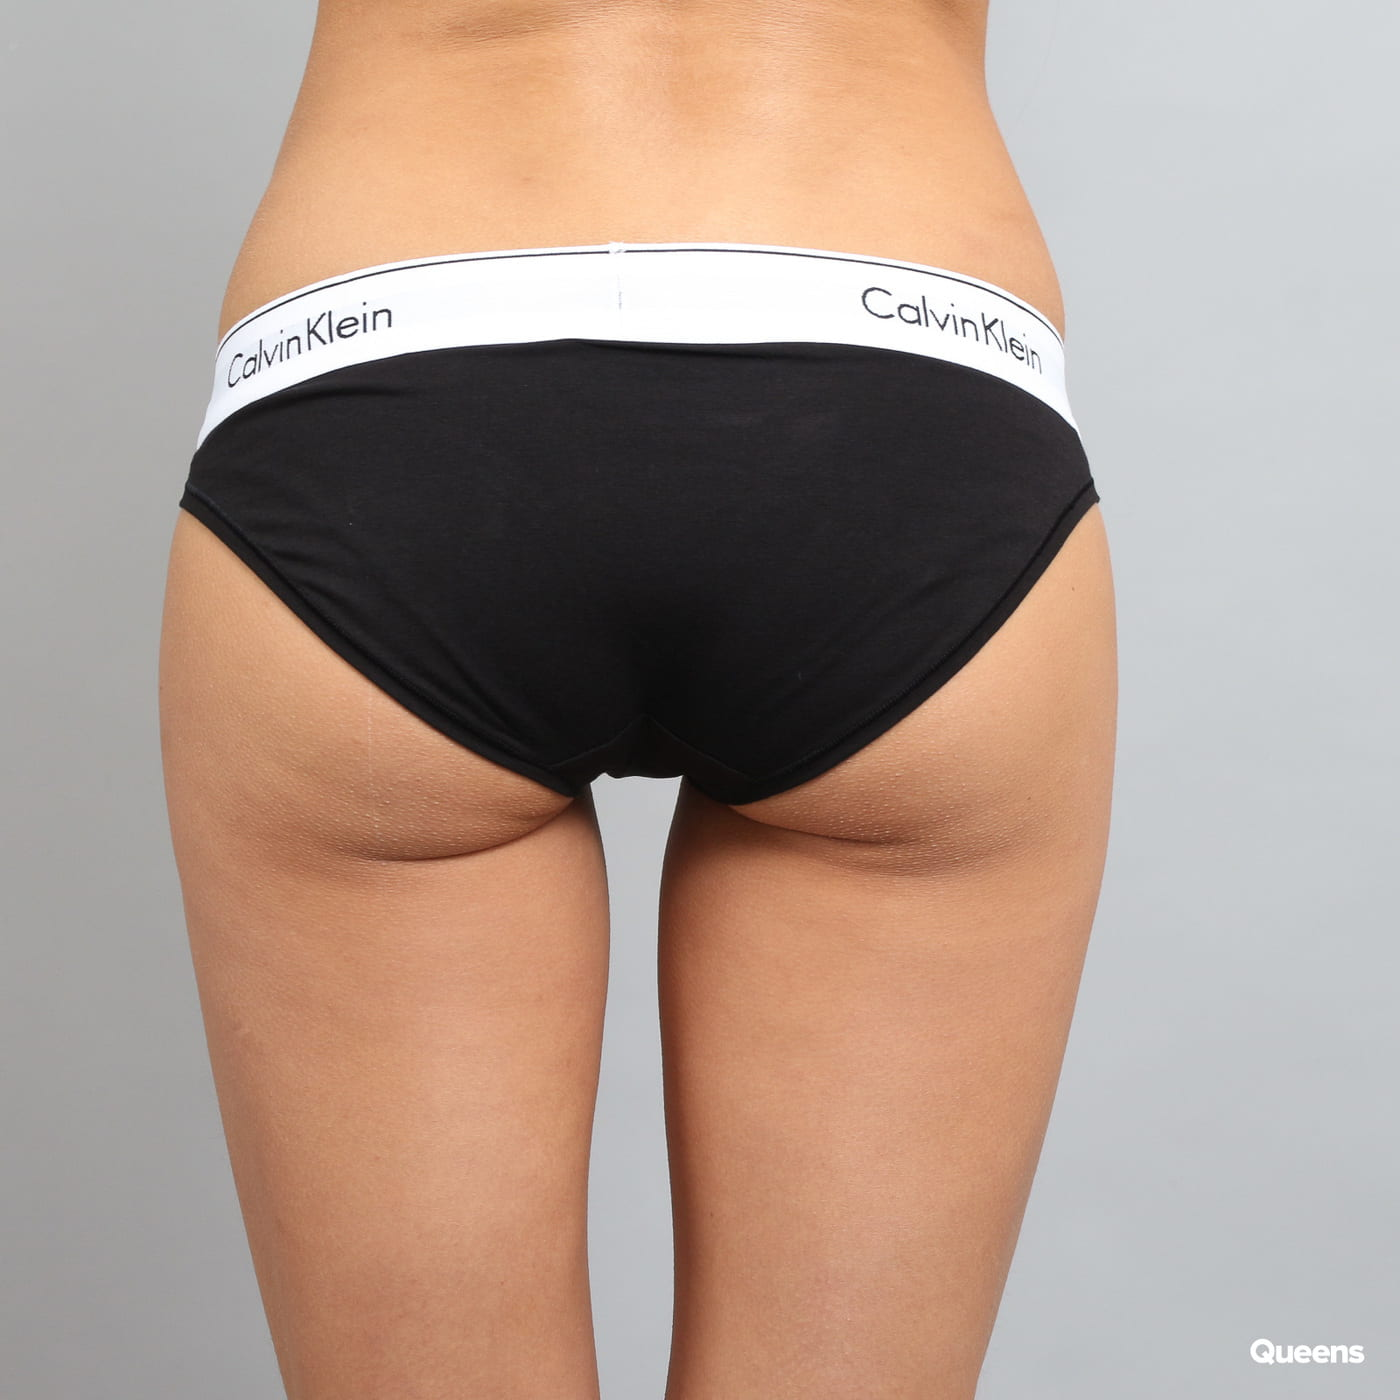 Calvin Klein Women's Bikini C/O black satin